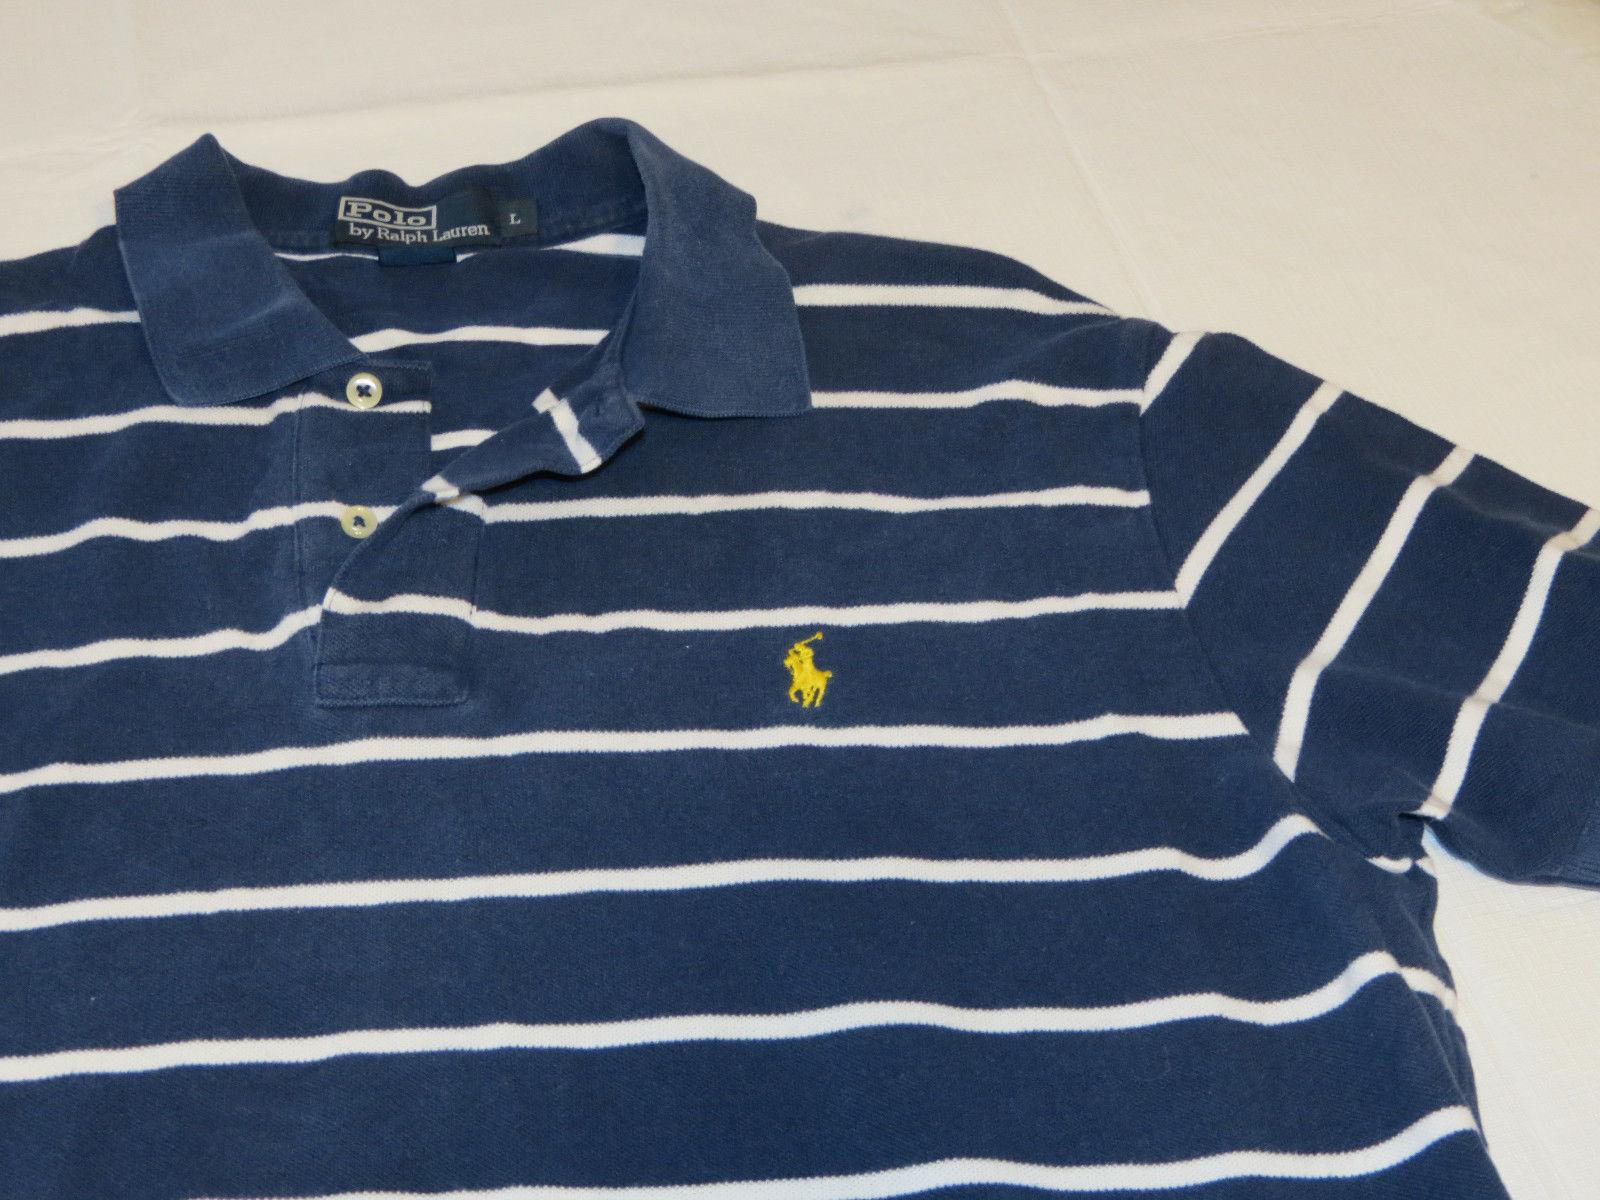 Polo by Ralph Lauren Men's short sleeve polo shirt navy blue L cotton EUC@